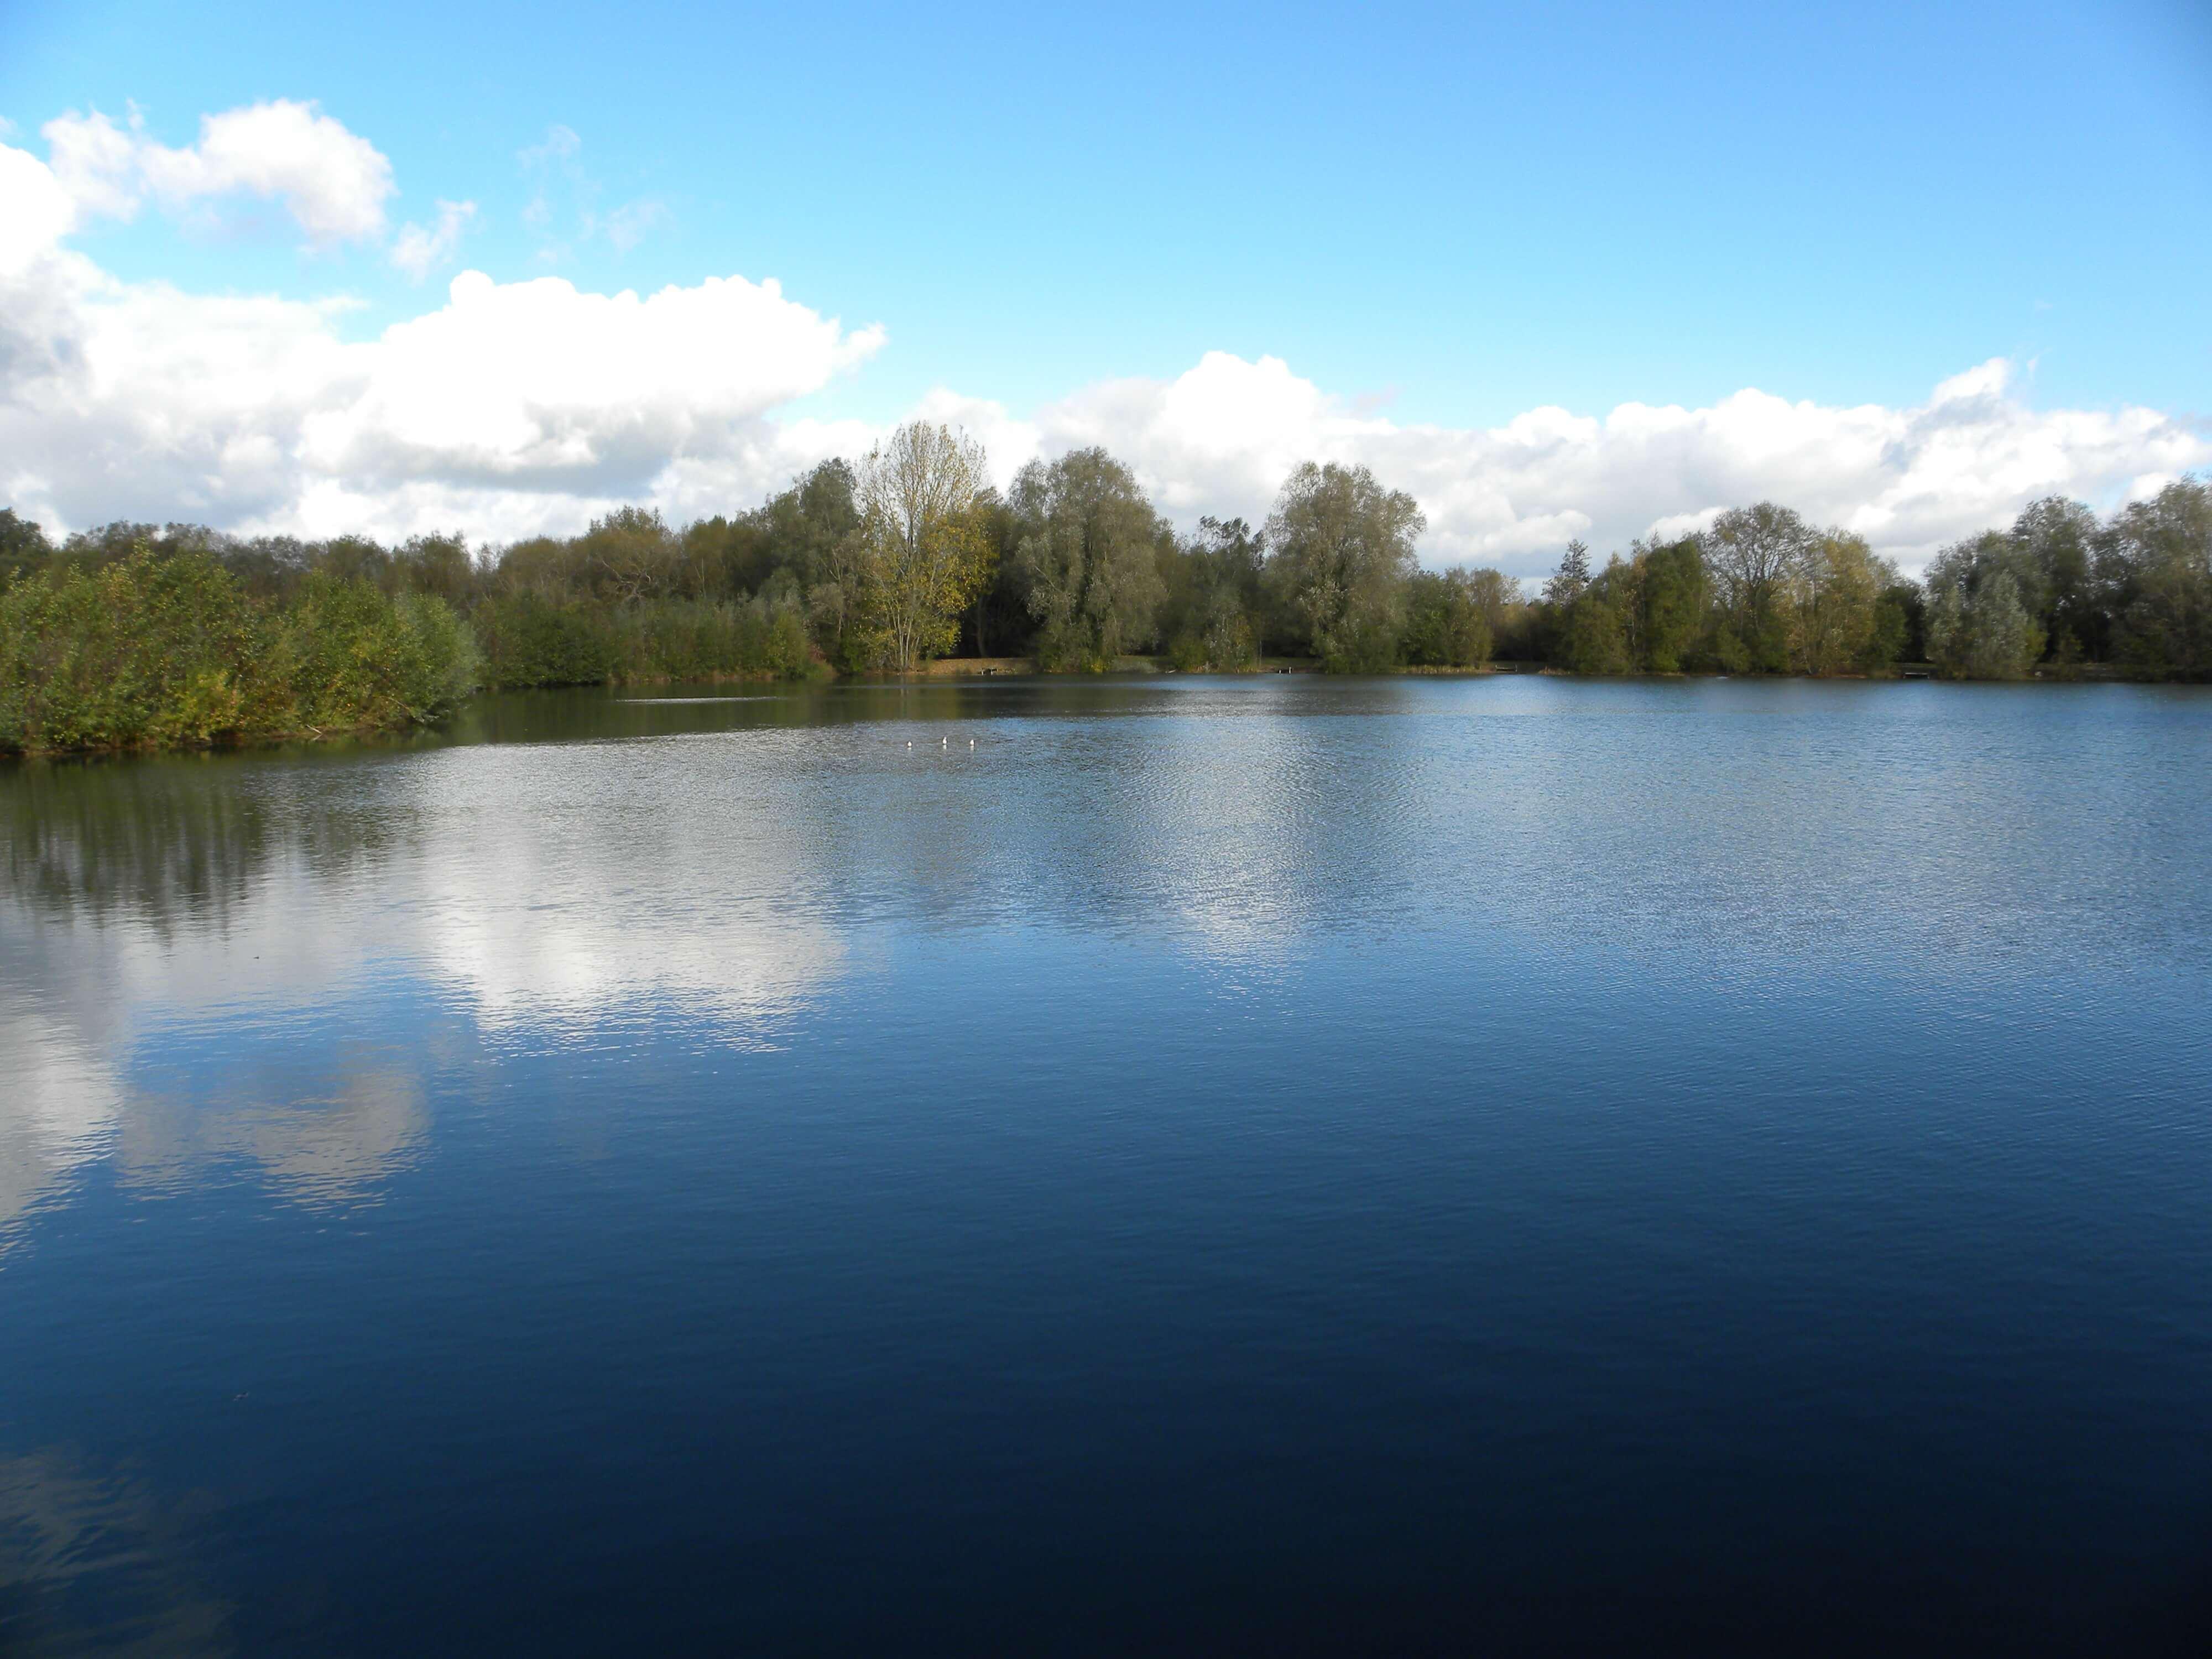 Waterlilly Lodge at Little Horseshoe Lake